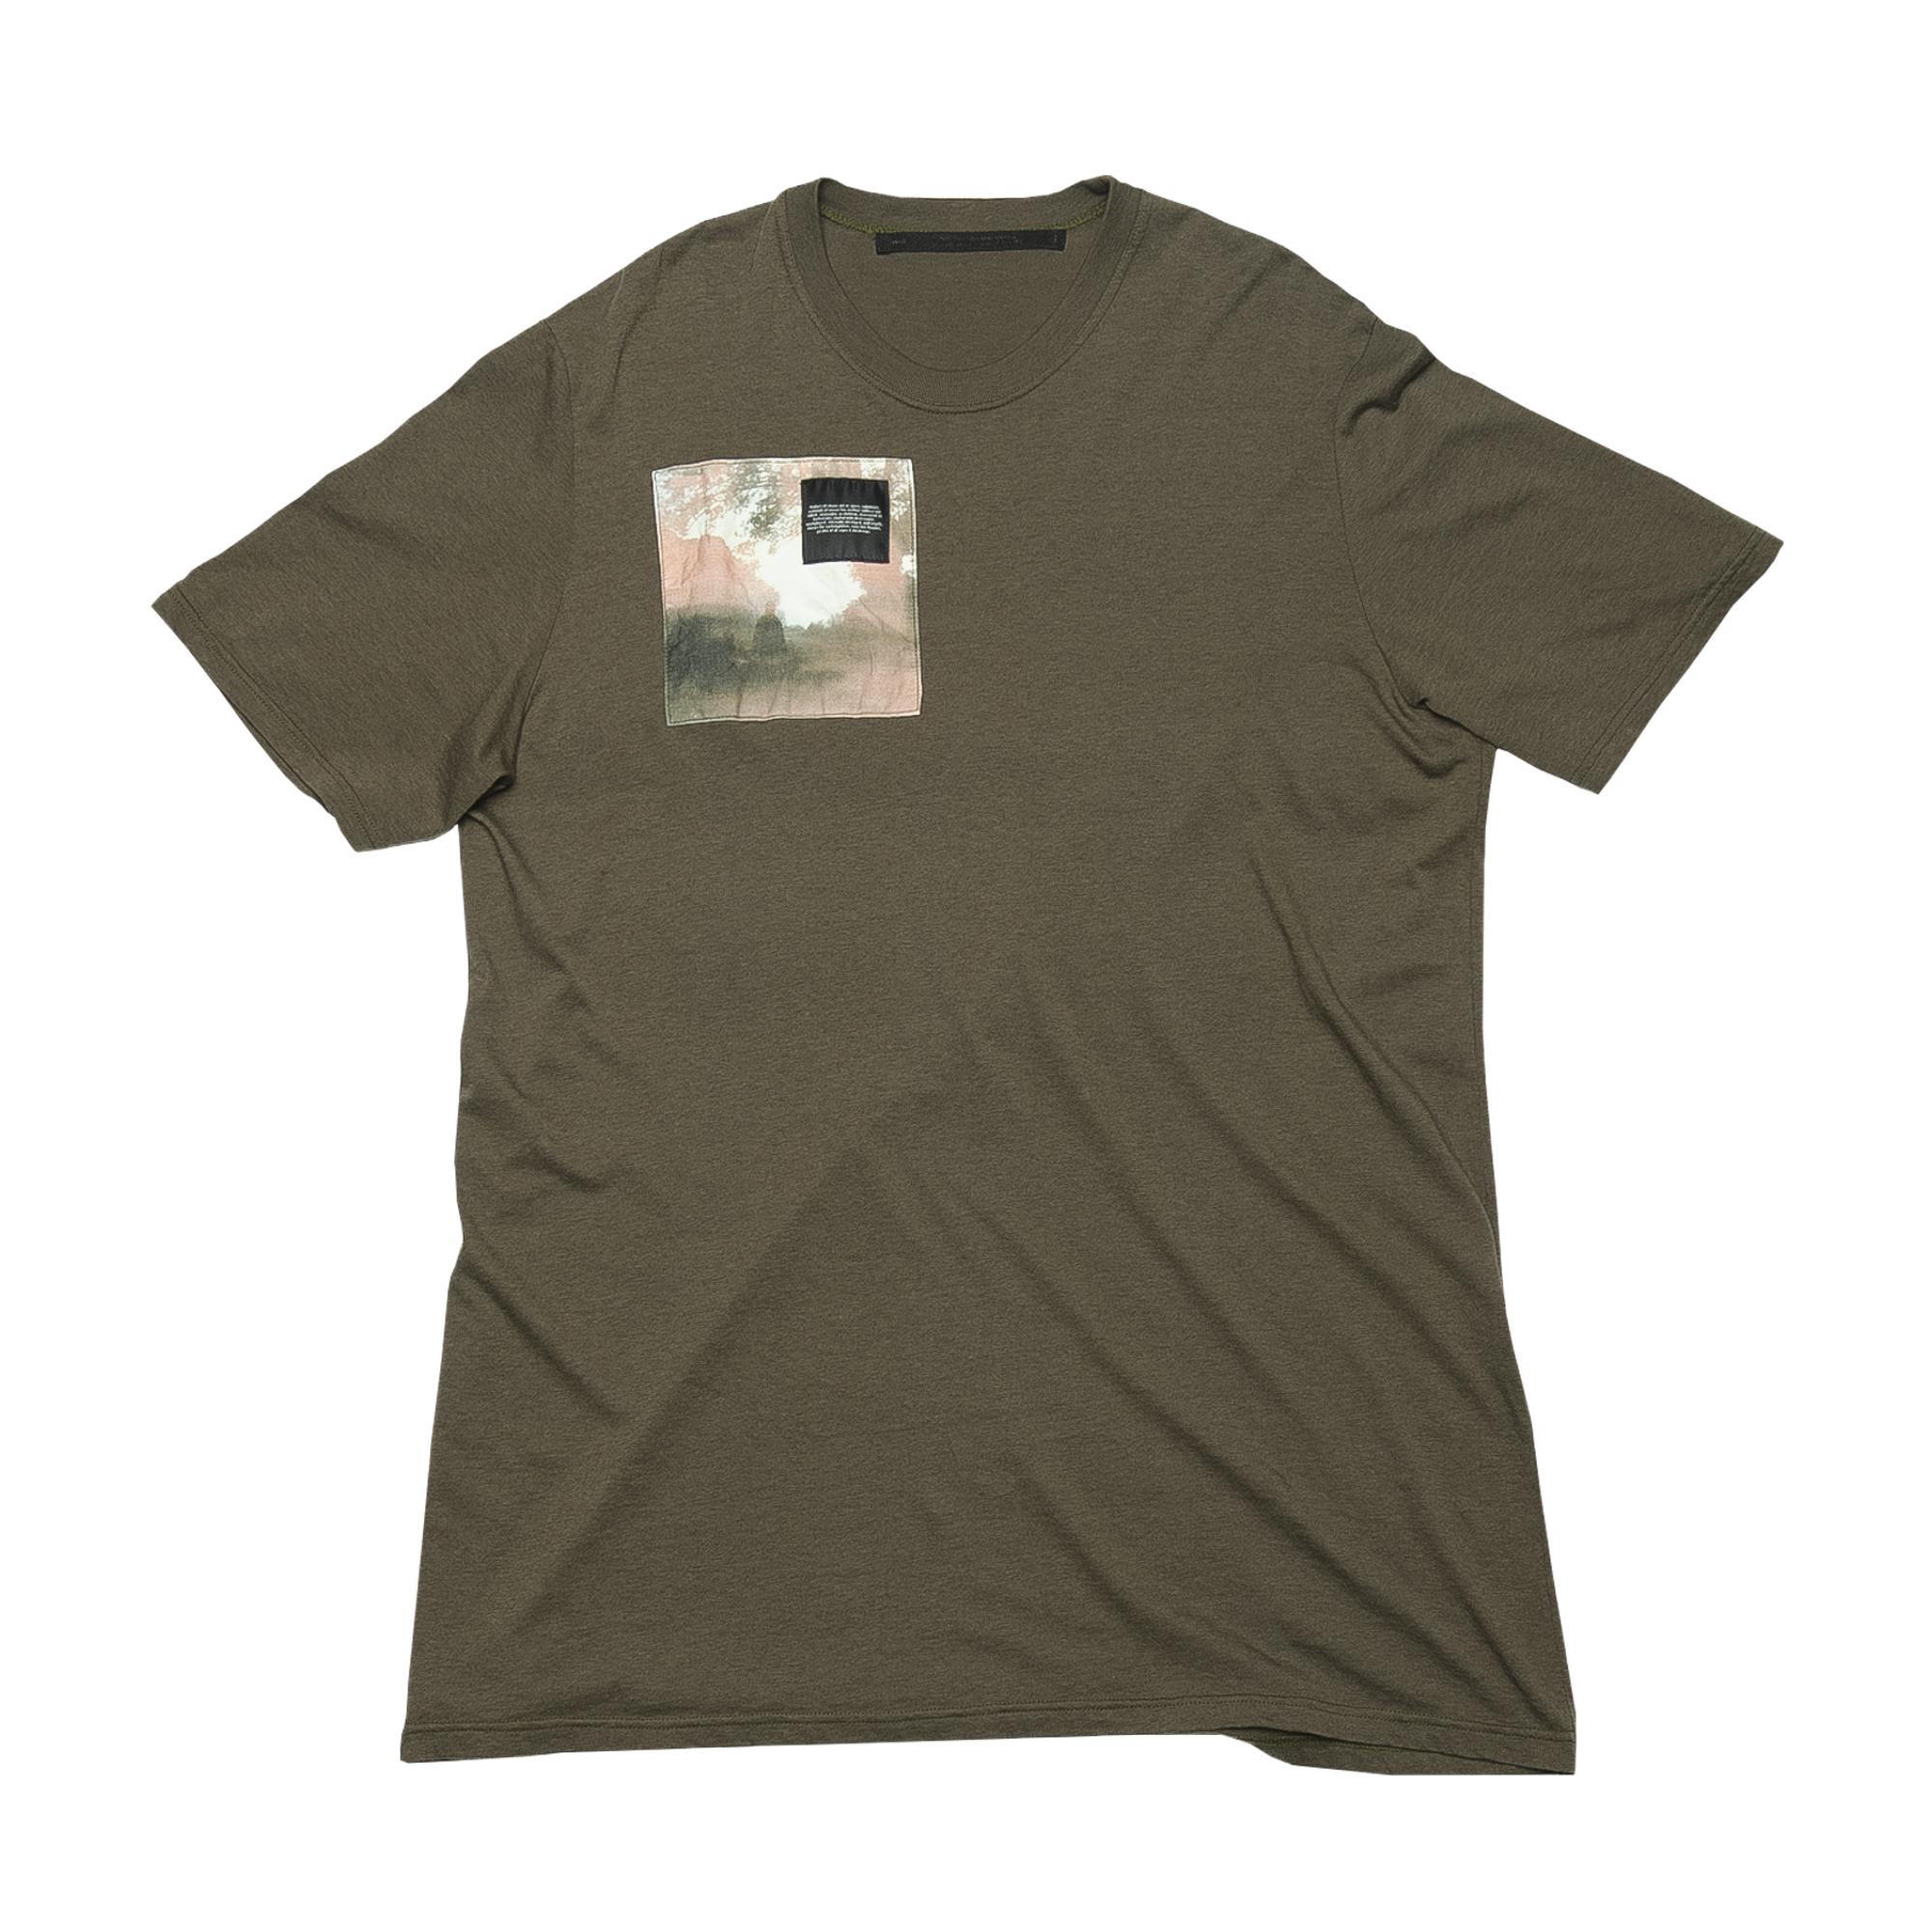 687CPM2-KHAKI / パッチプリントTシャツ